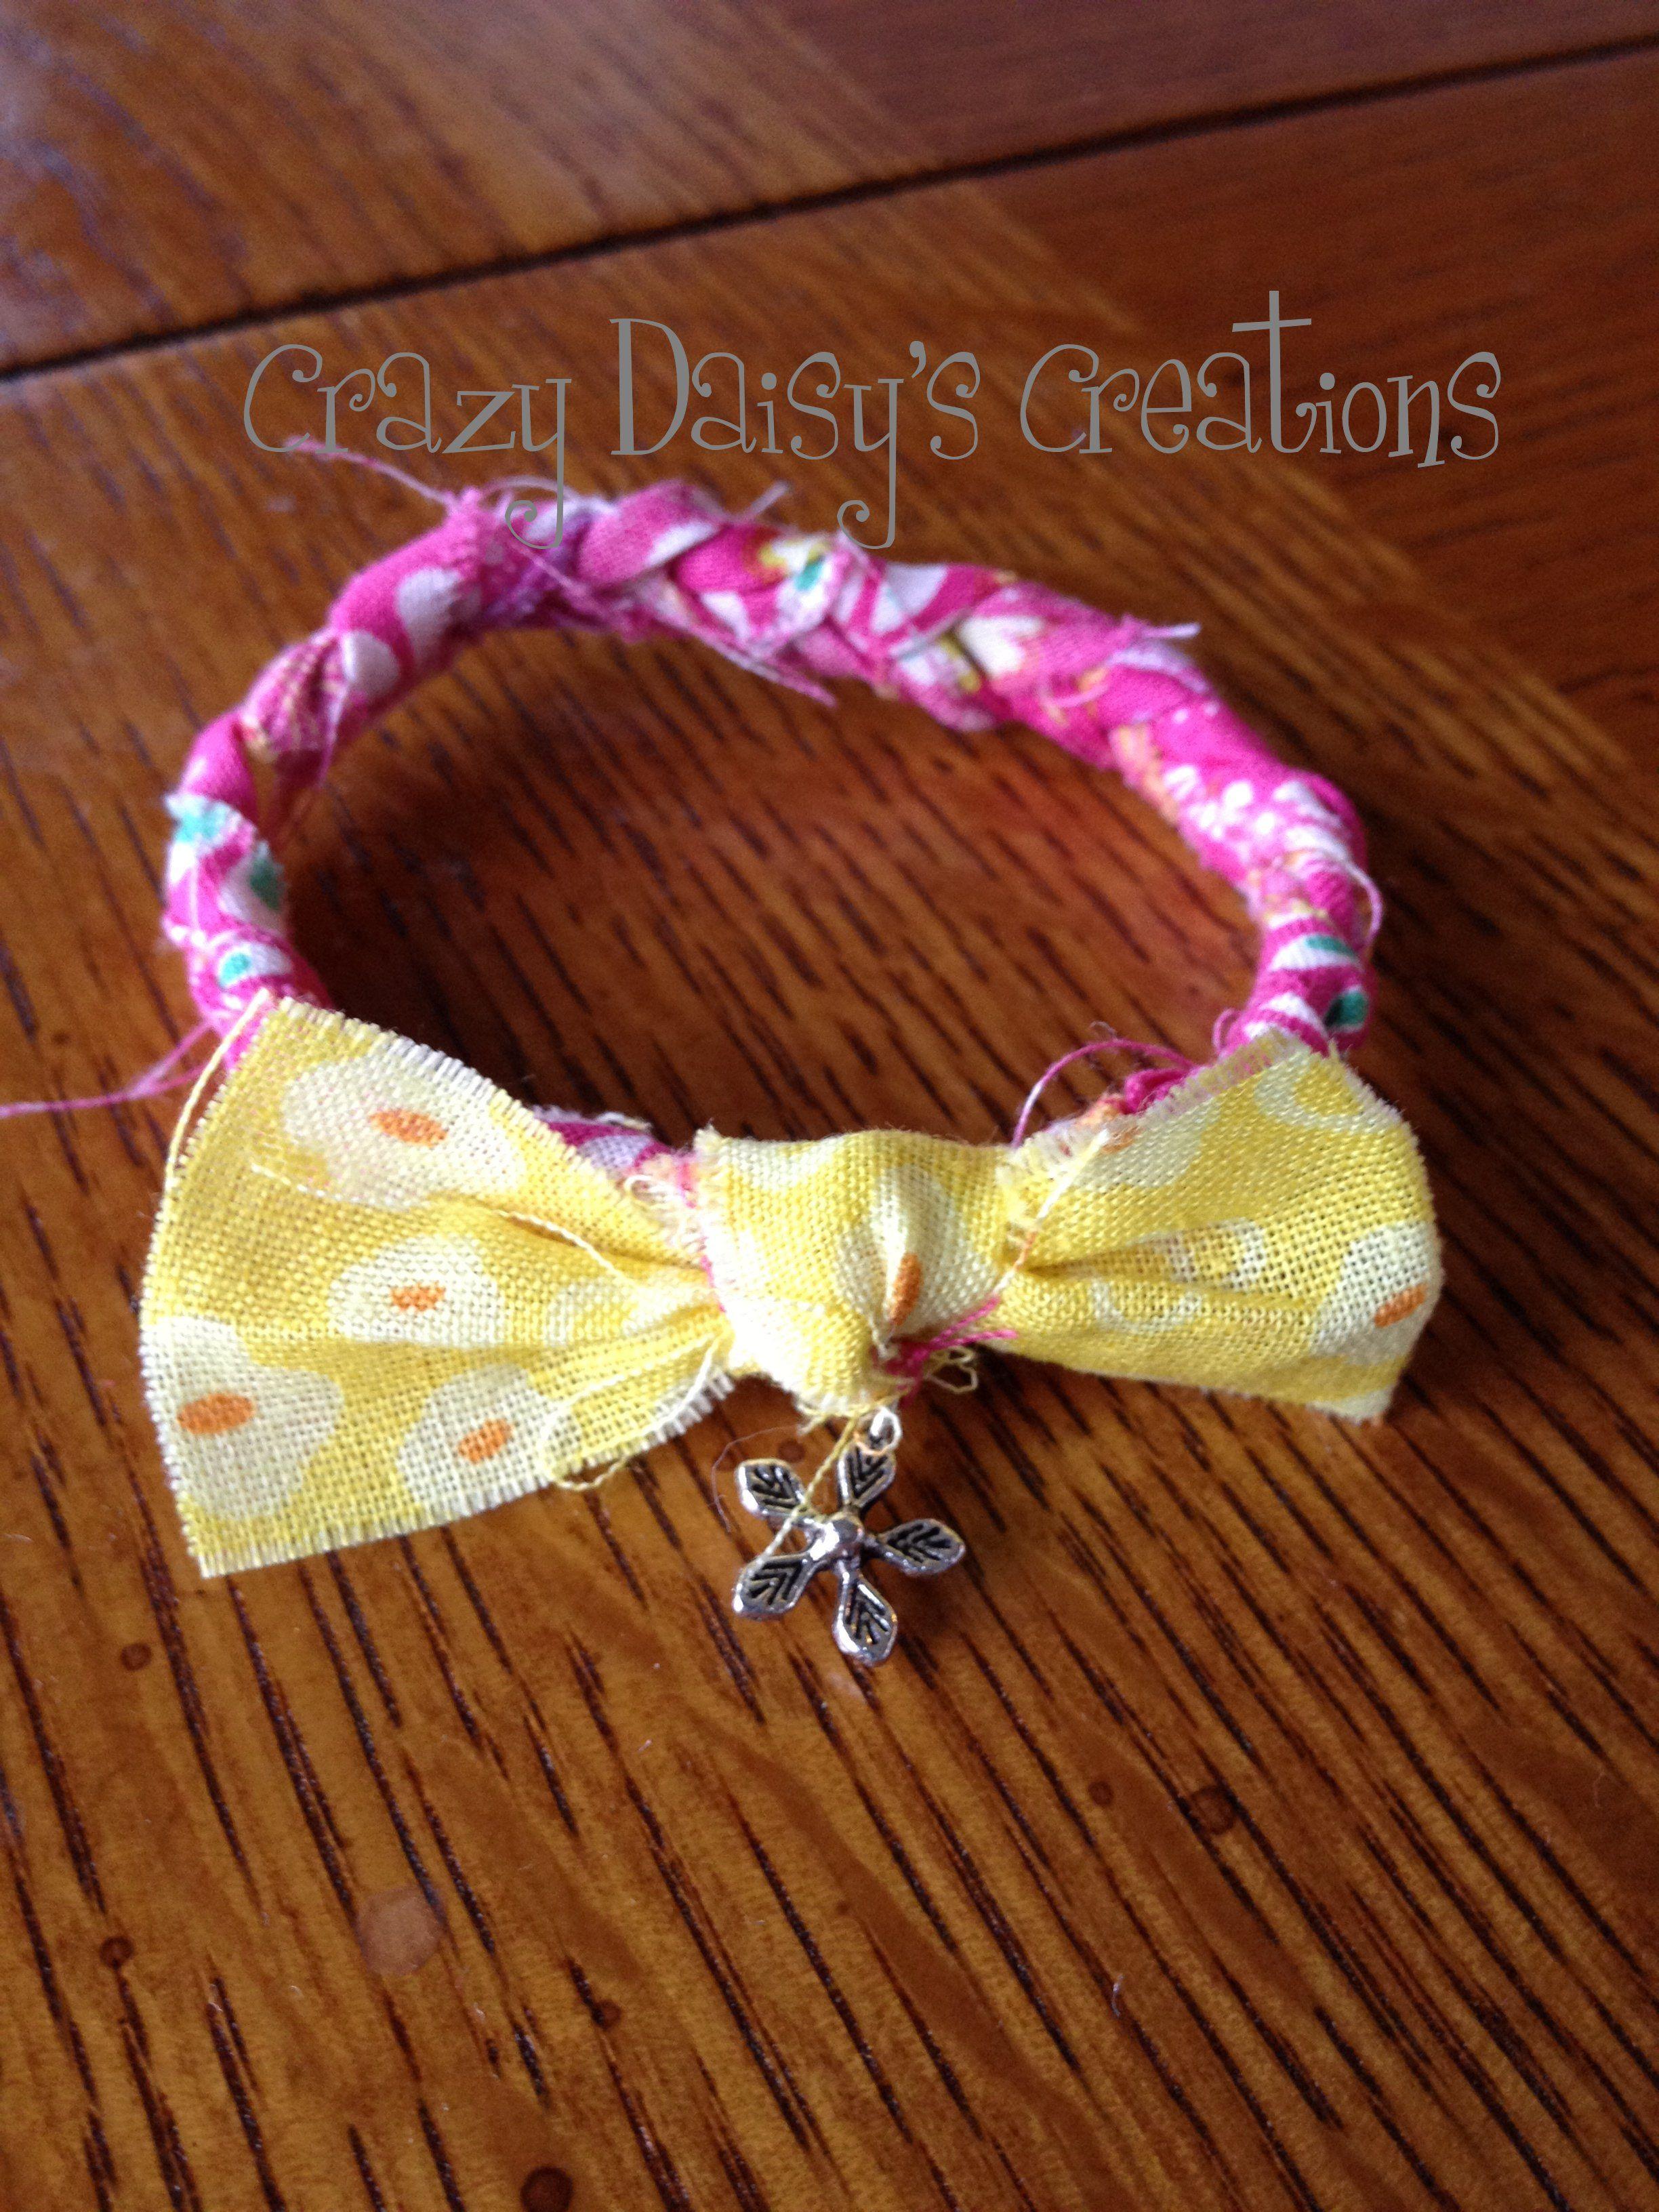 Fabric bracelet with daisy charm